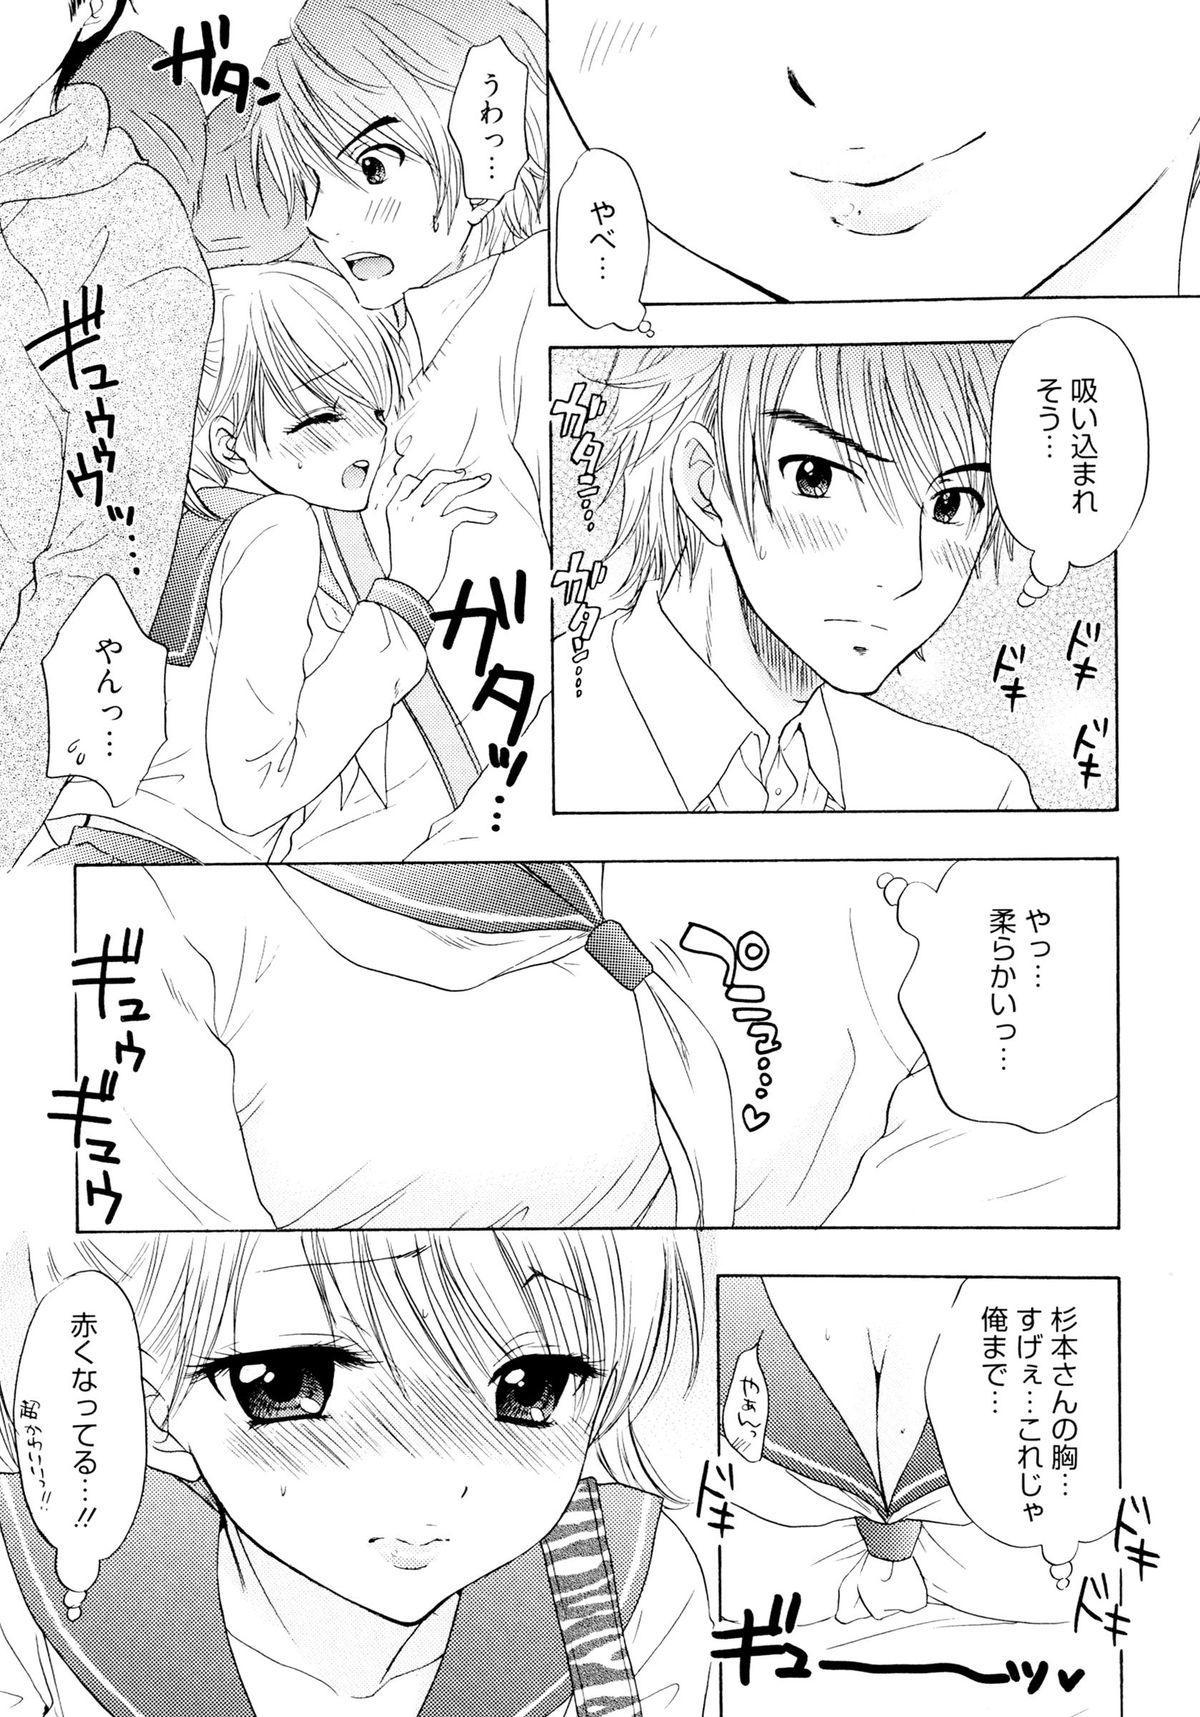 The Great Escape 4 Shokai Genteiban 62